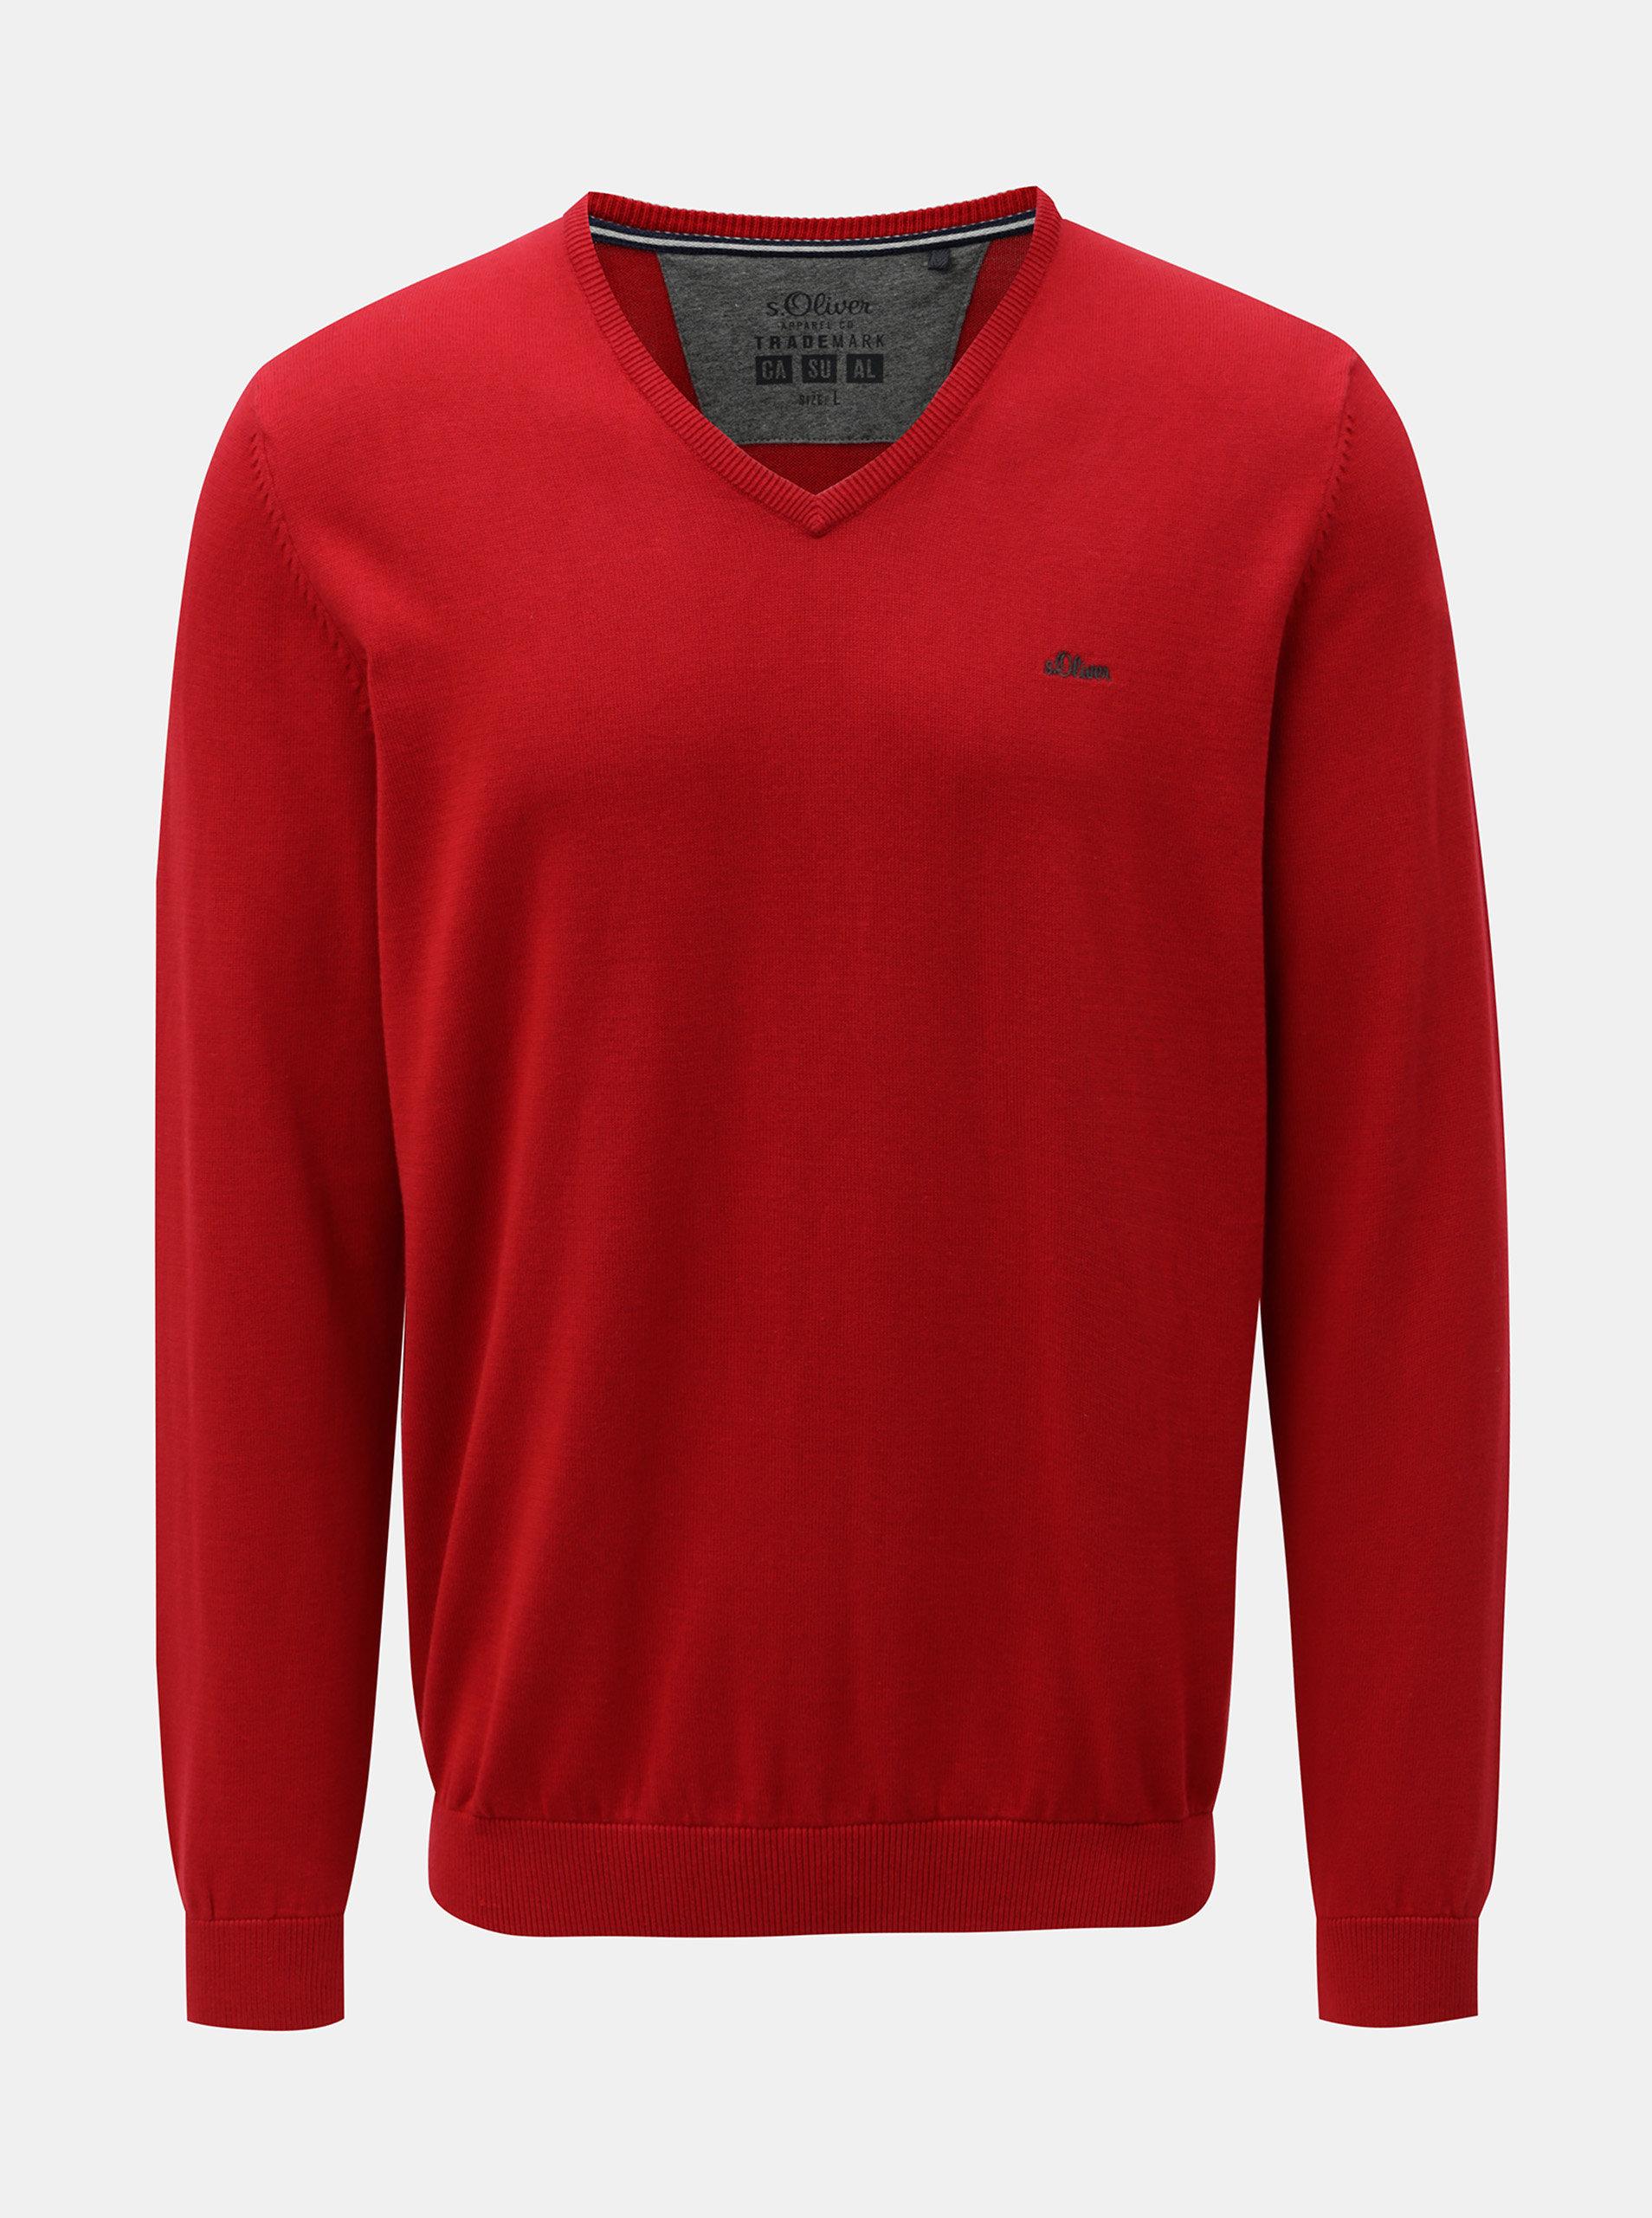 Červený pánský lehký svetr s véčkovým výstřihem s.Oliver